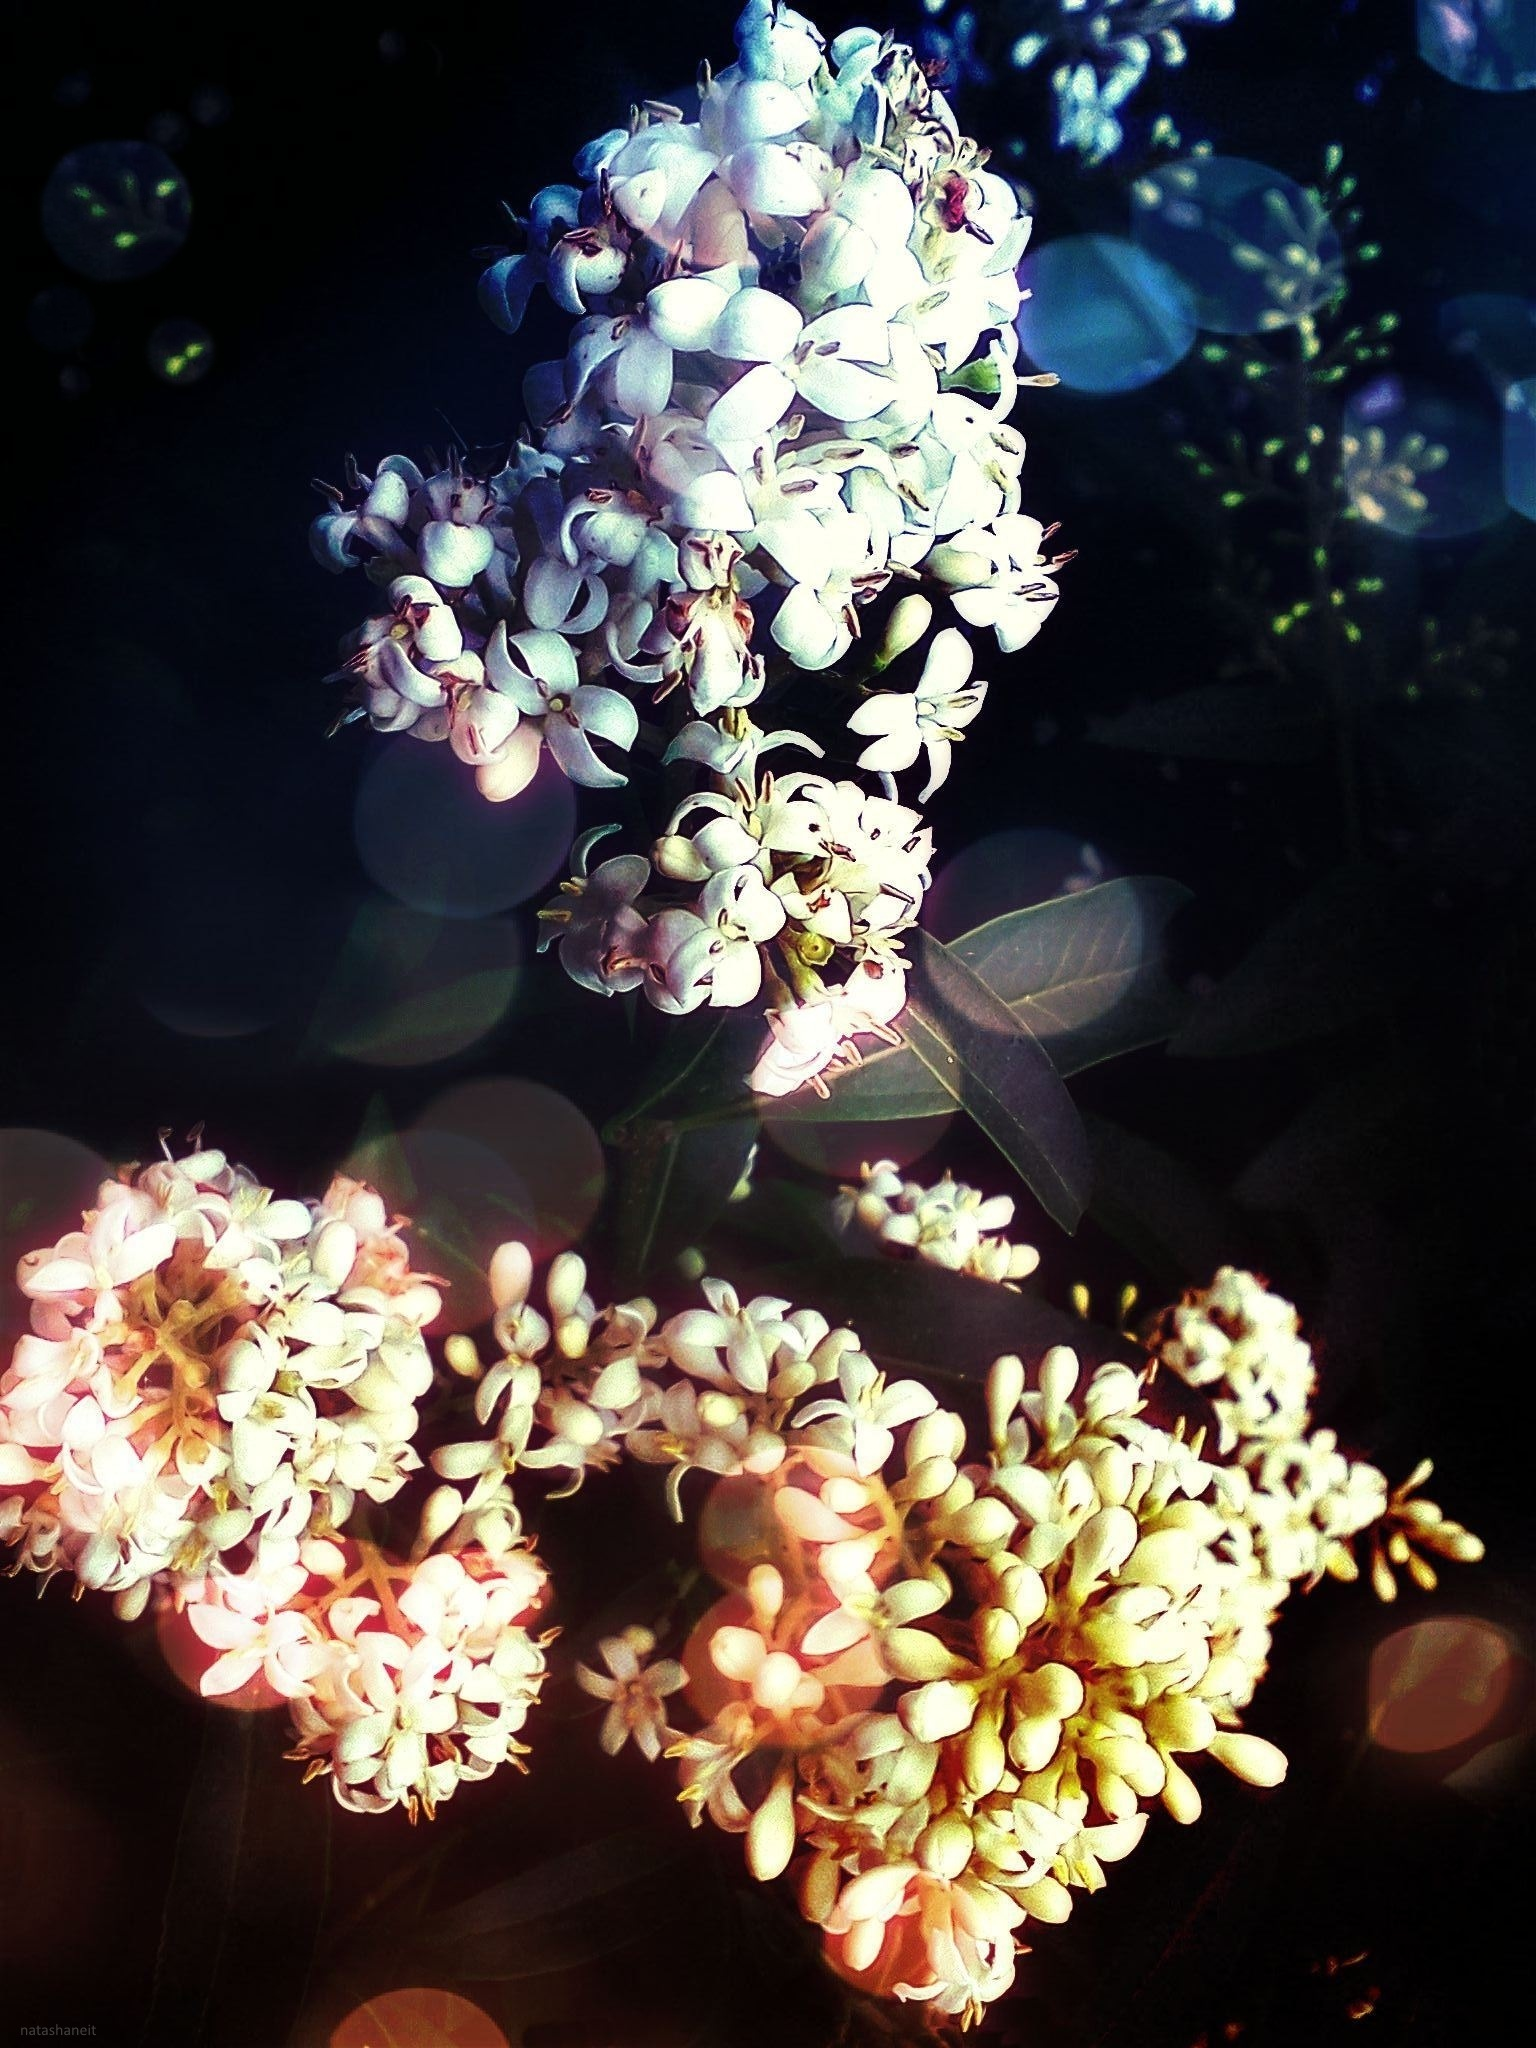 Spring flowering by natashaneit